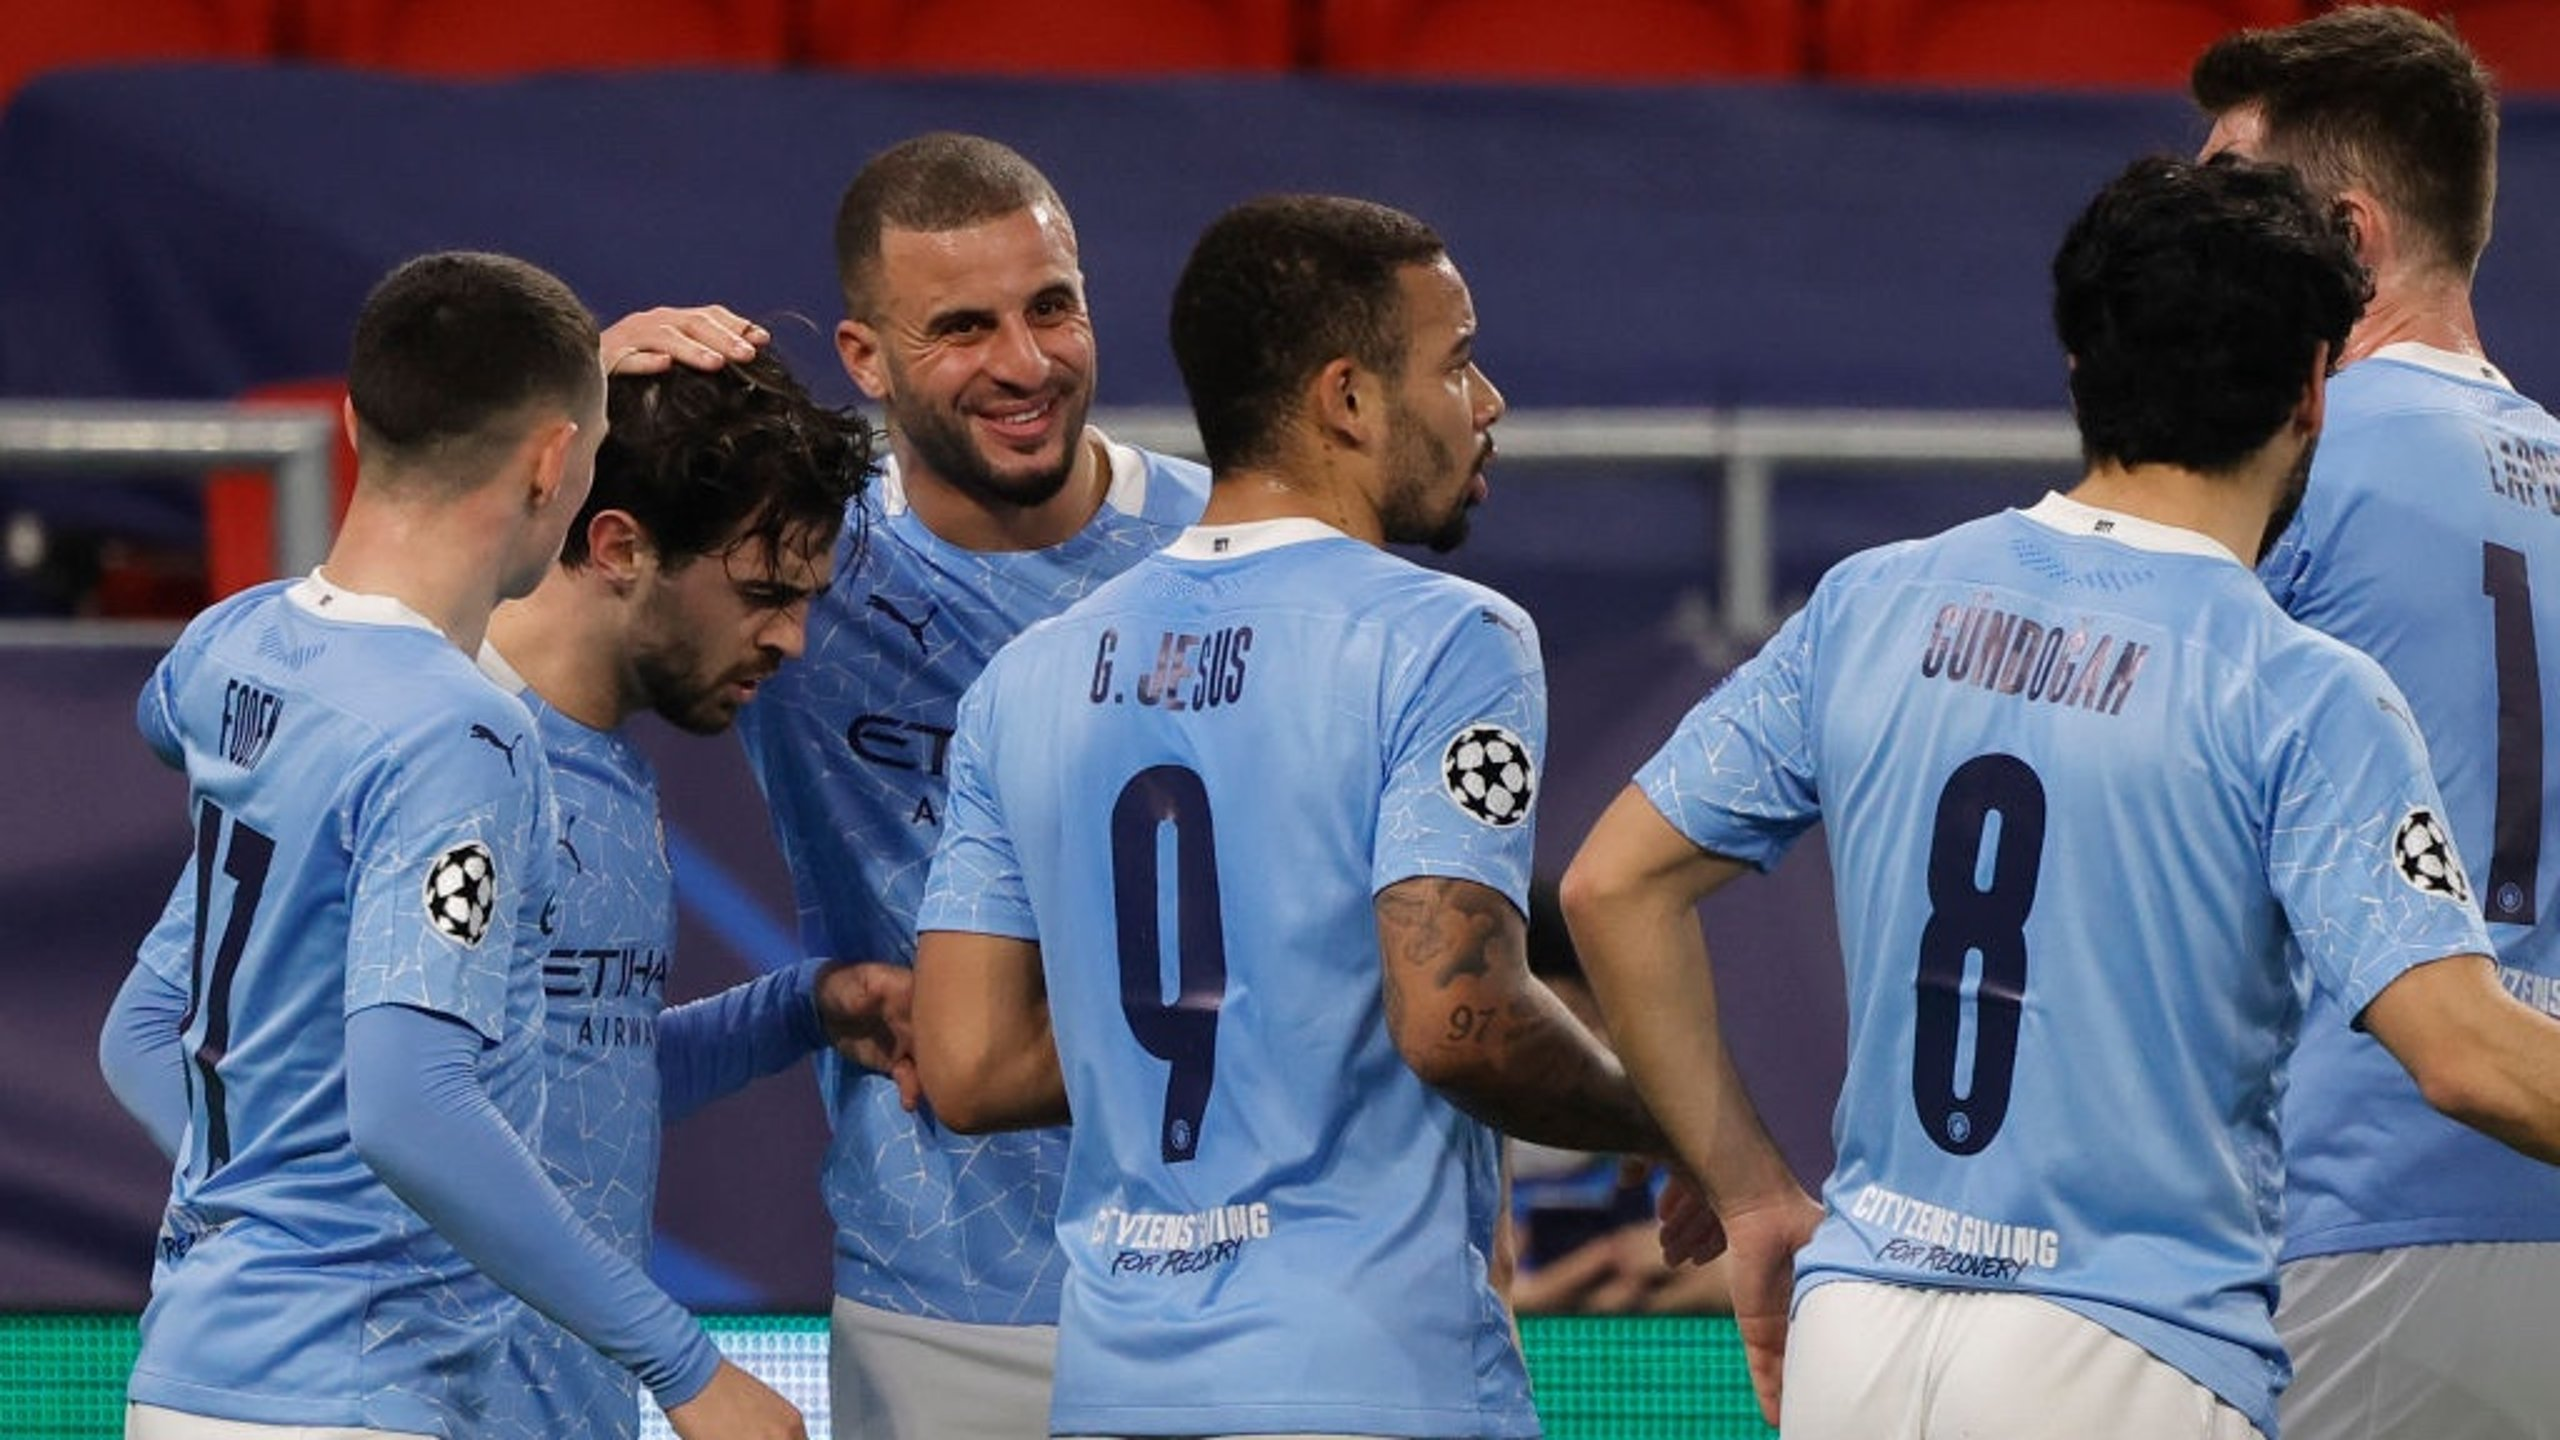 BER-NODDO: The players gather to congratulate Bernardo after his accurate headed goal.